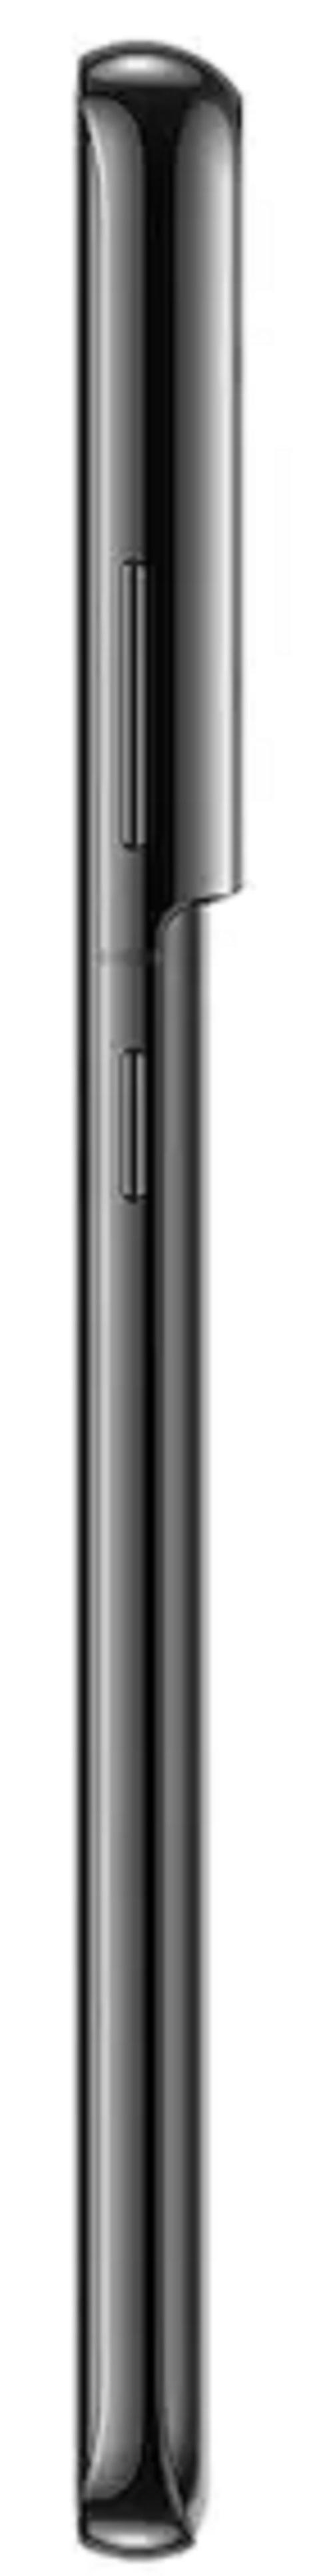 thumbnail 25 - Samsung Galaxy G998U S21 Ultra 5G 128GB Unlocked Smartphone - Excellent